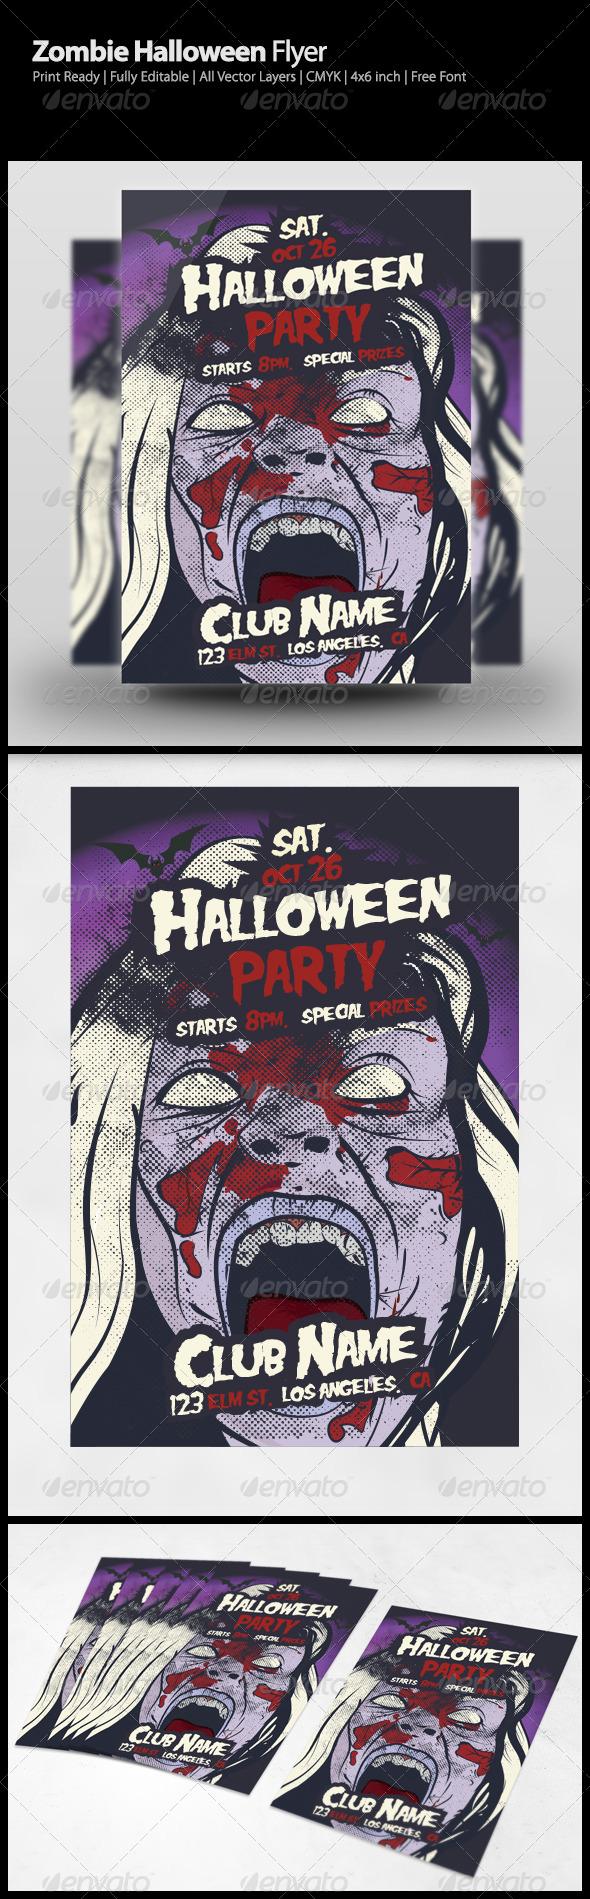 Zombie Halloween Flyer  Diseo    Flyer Template